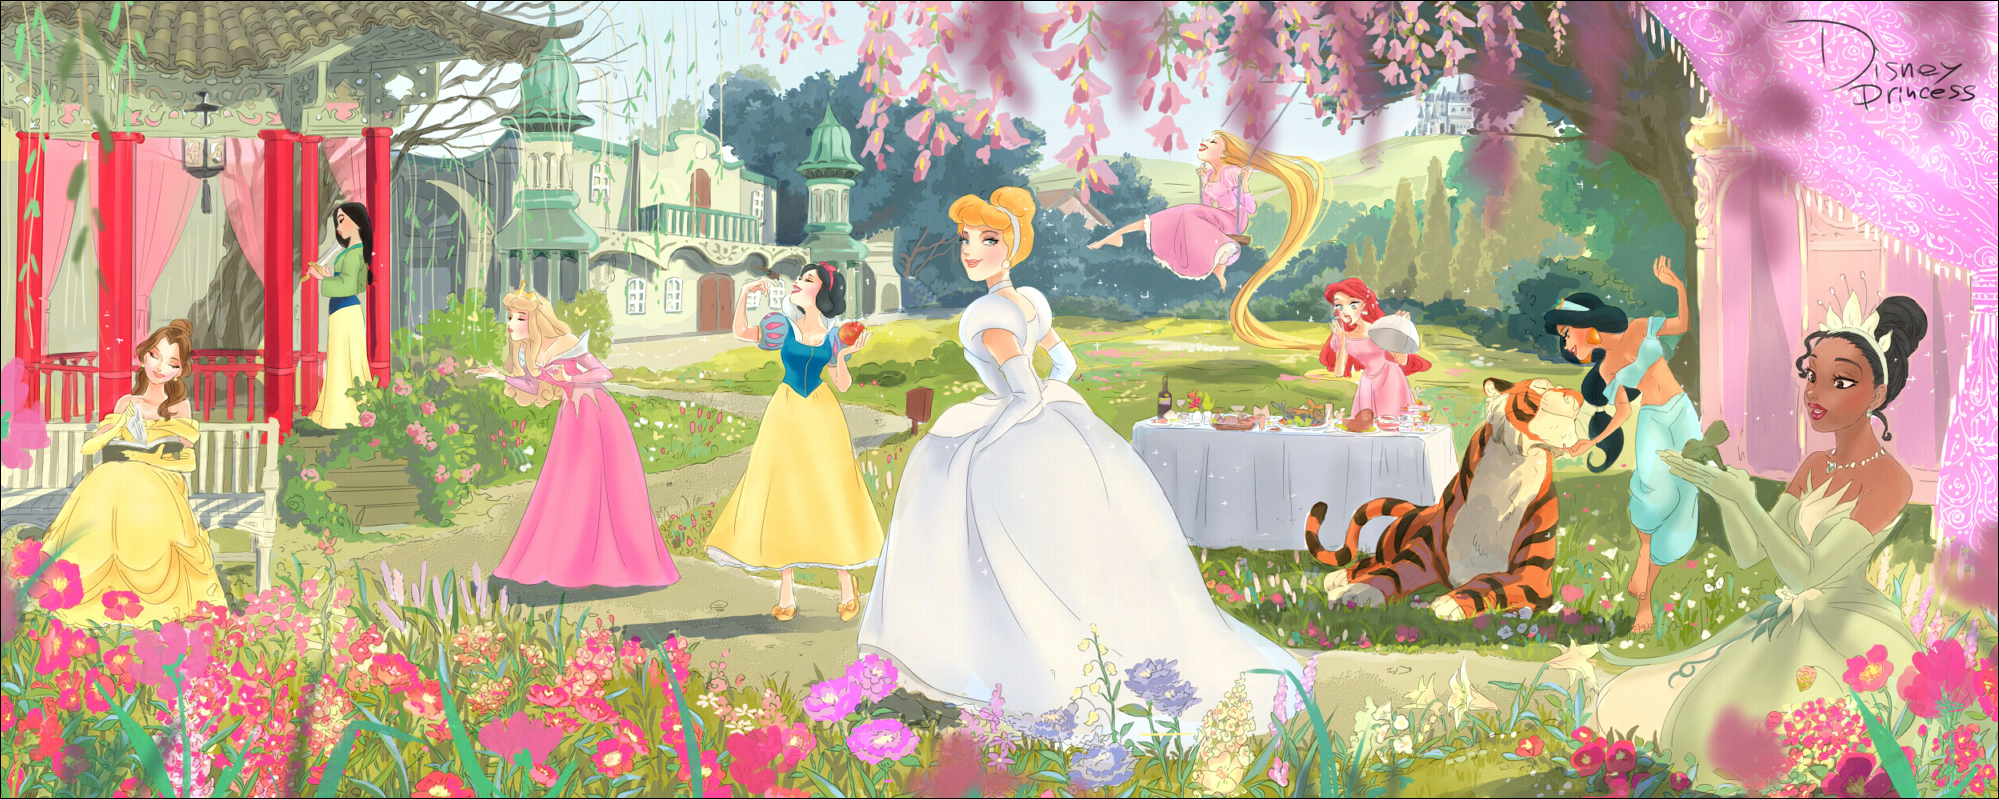 Disney Image 1464111 Zerochan Anime Image Board